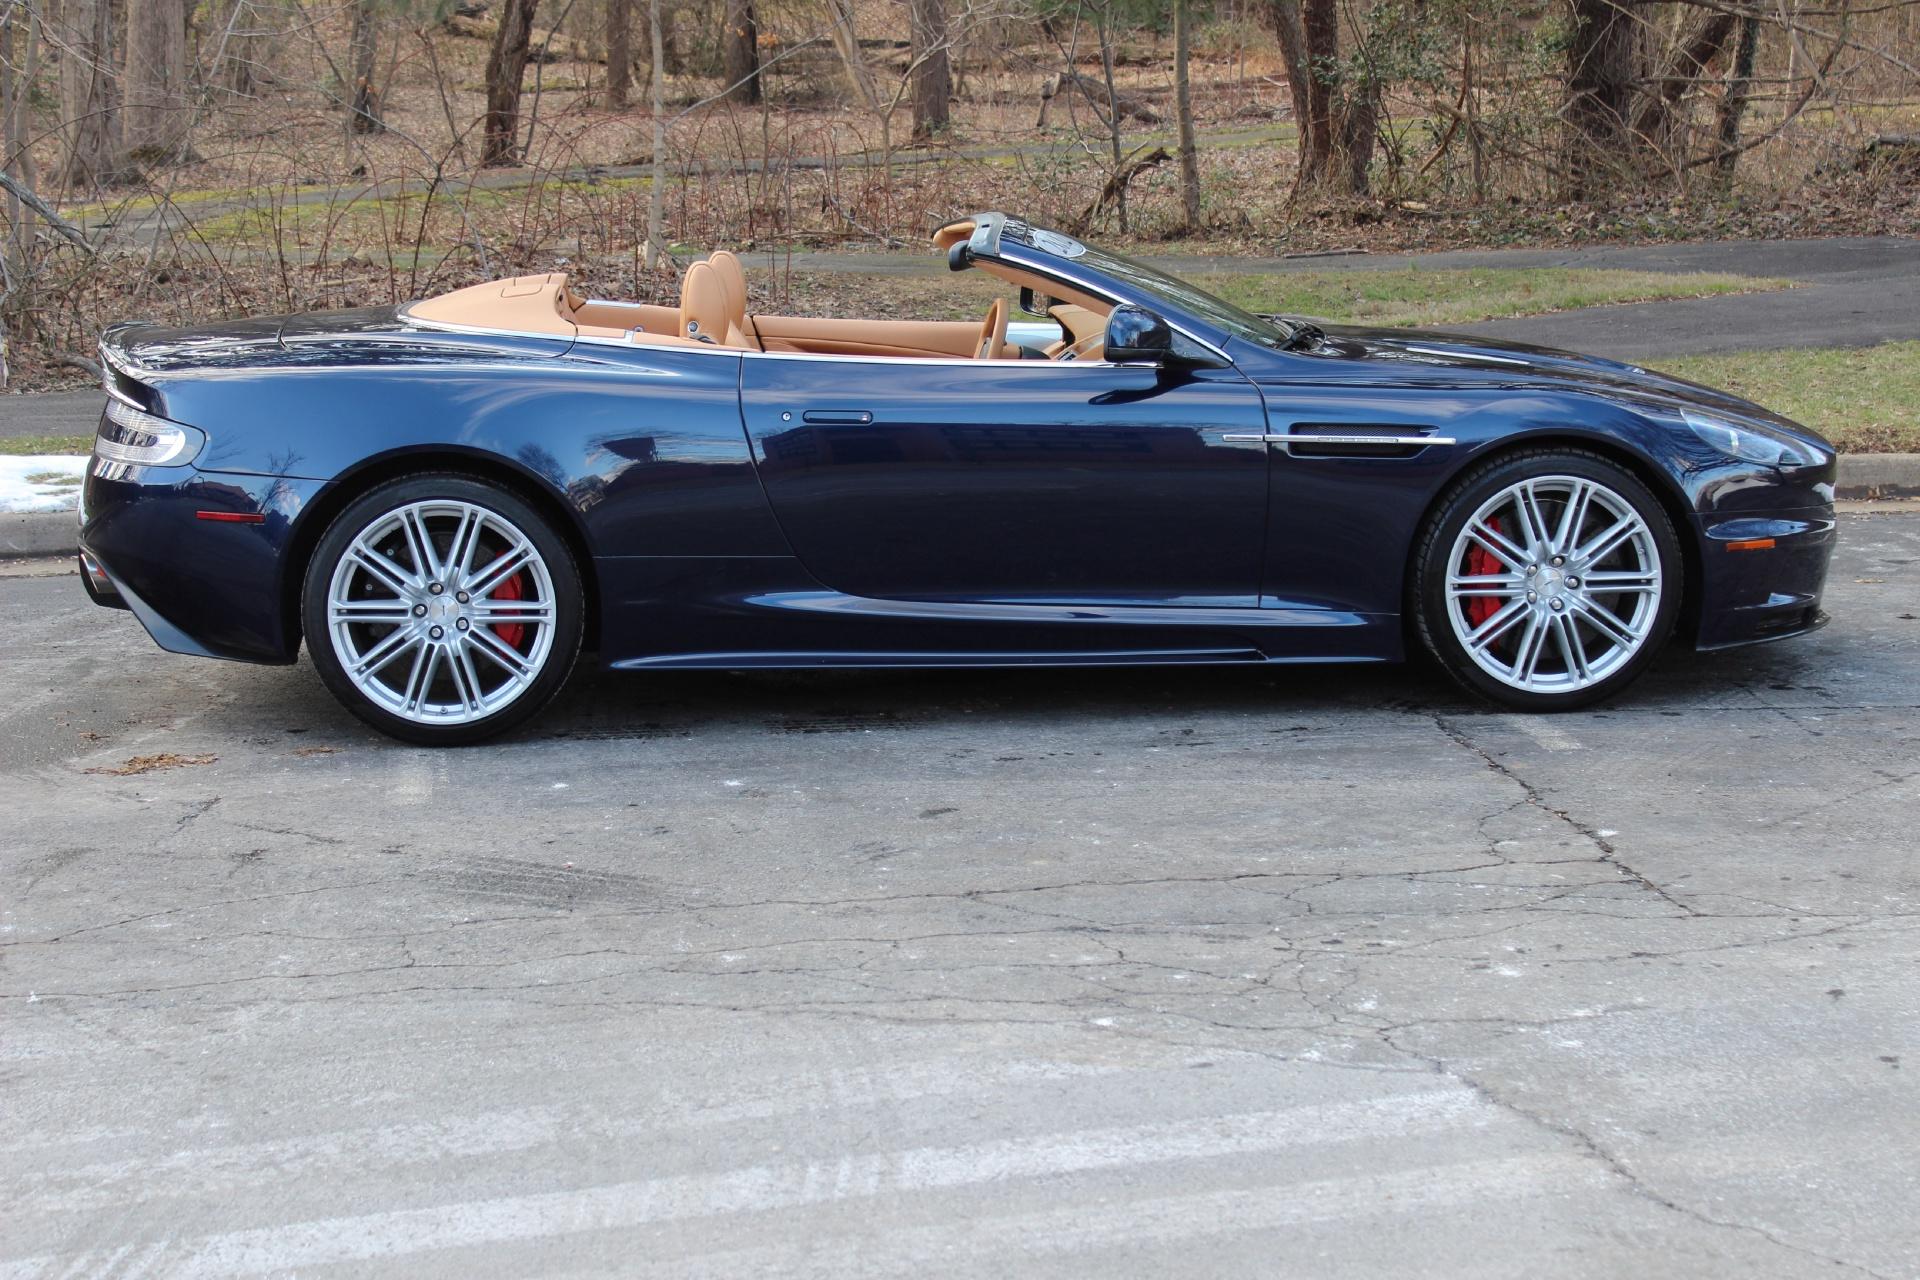 Aston Martin DBS Volante Volante Stock PE For Sale Near - Aston martin dbs for sale